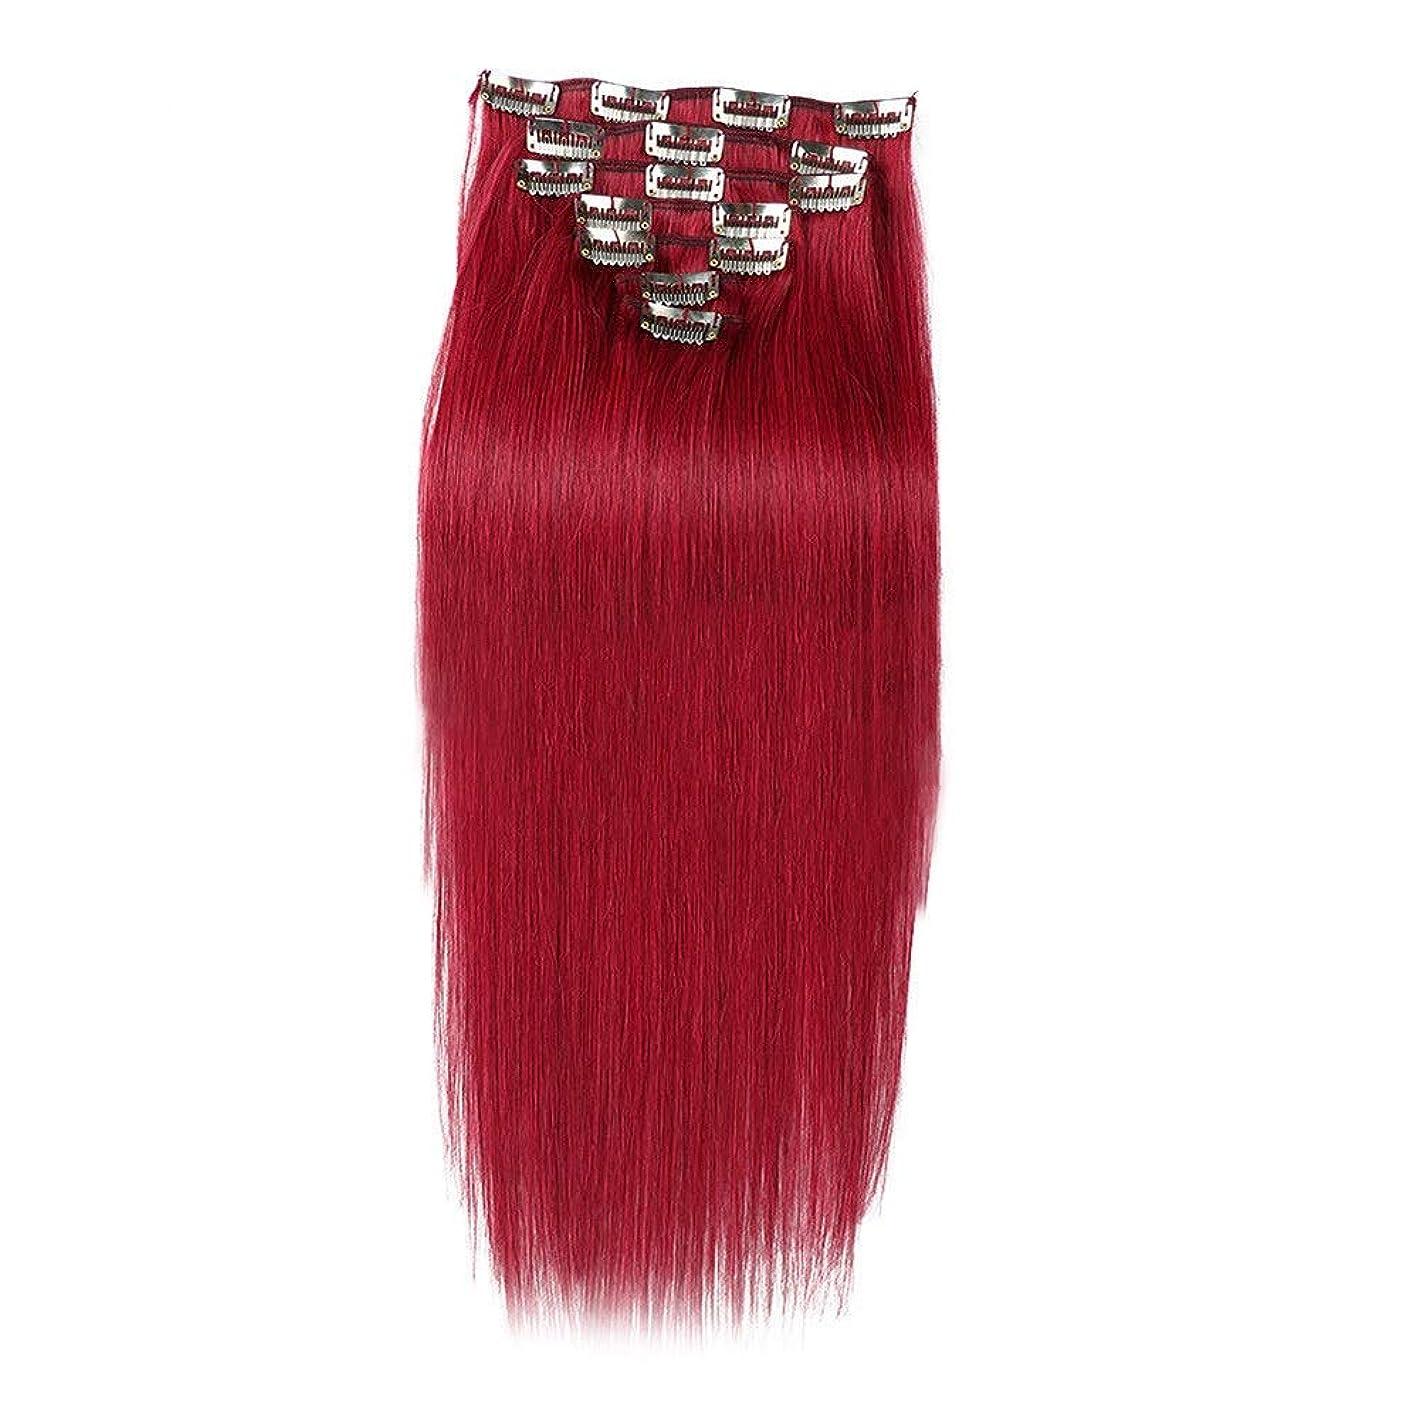 HOHYLLYA ヘアエクステンション人毛16インチ7個70gダブル横糸ソフトストレートヘア用女性かつら赤いかつら (色 : #BURG)